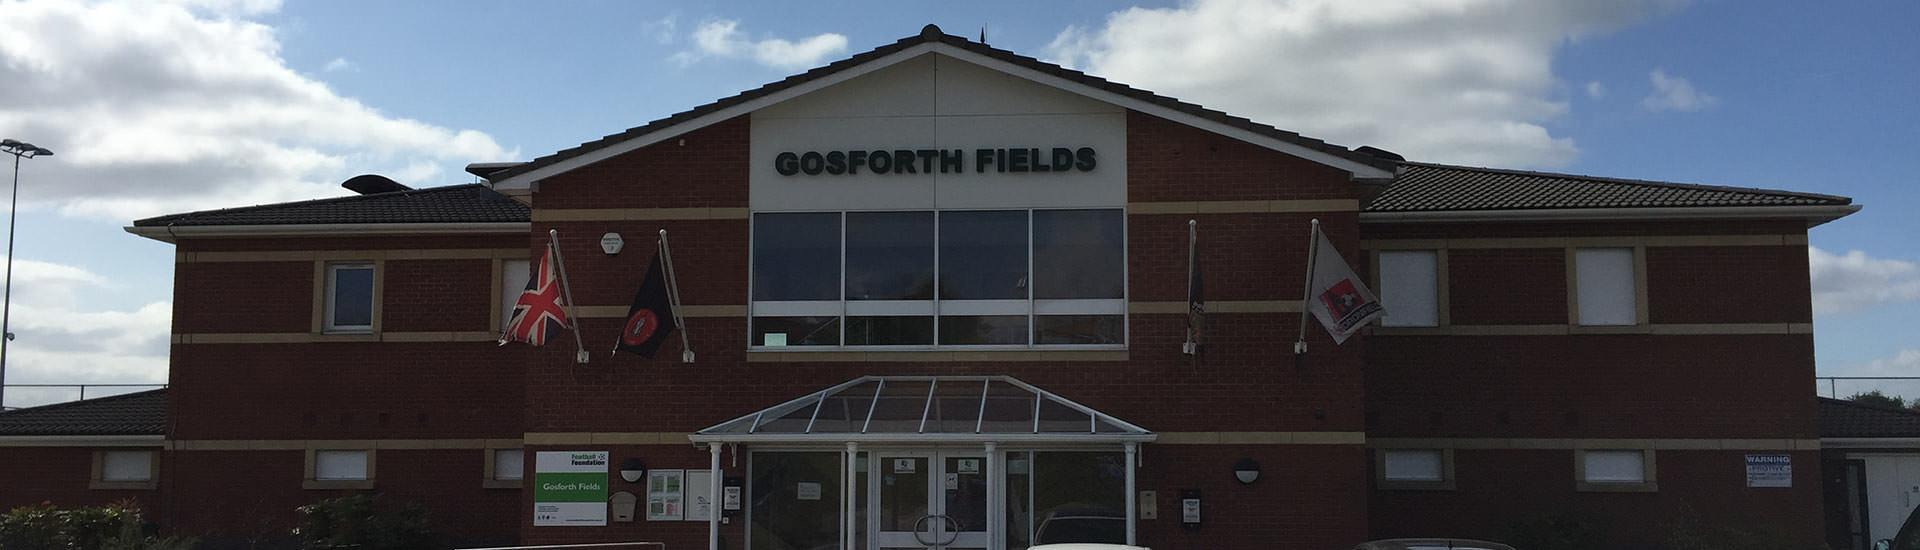 Gosforth Fields Clubhouse